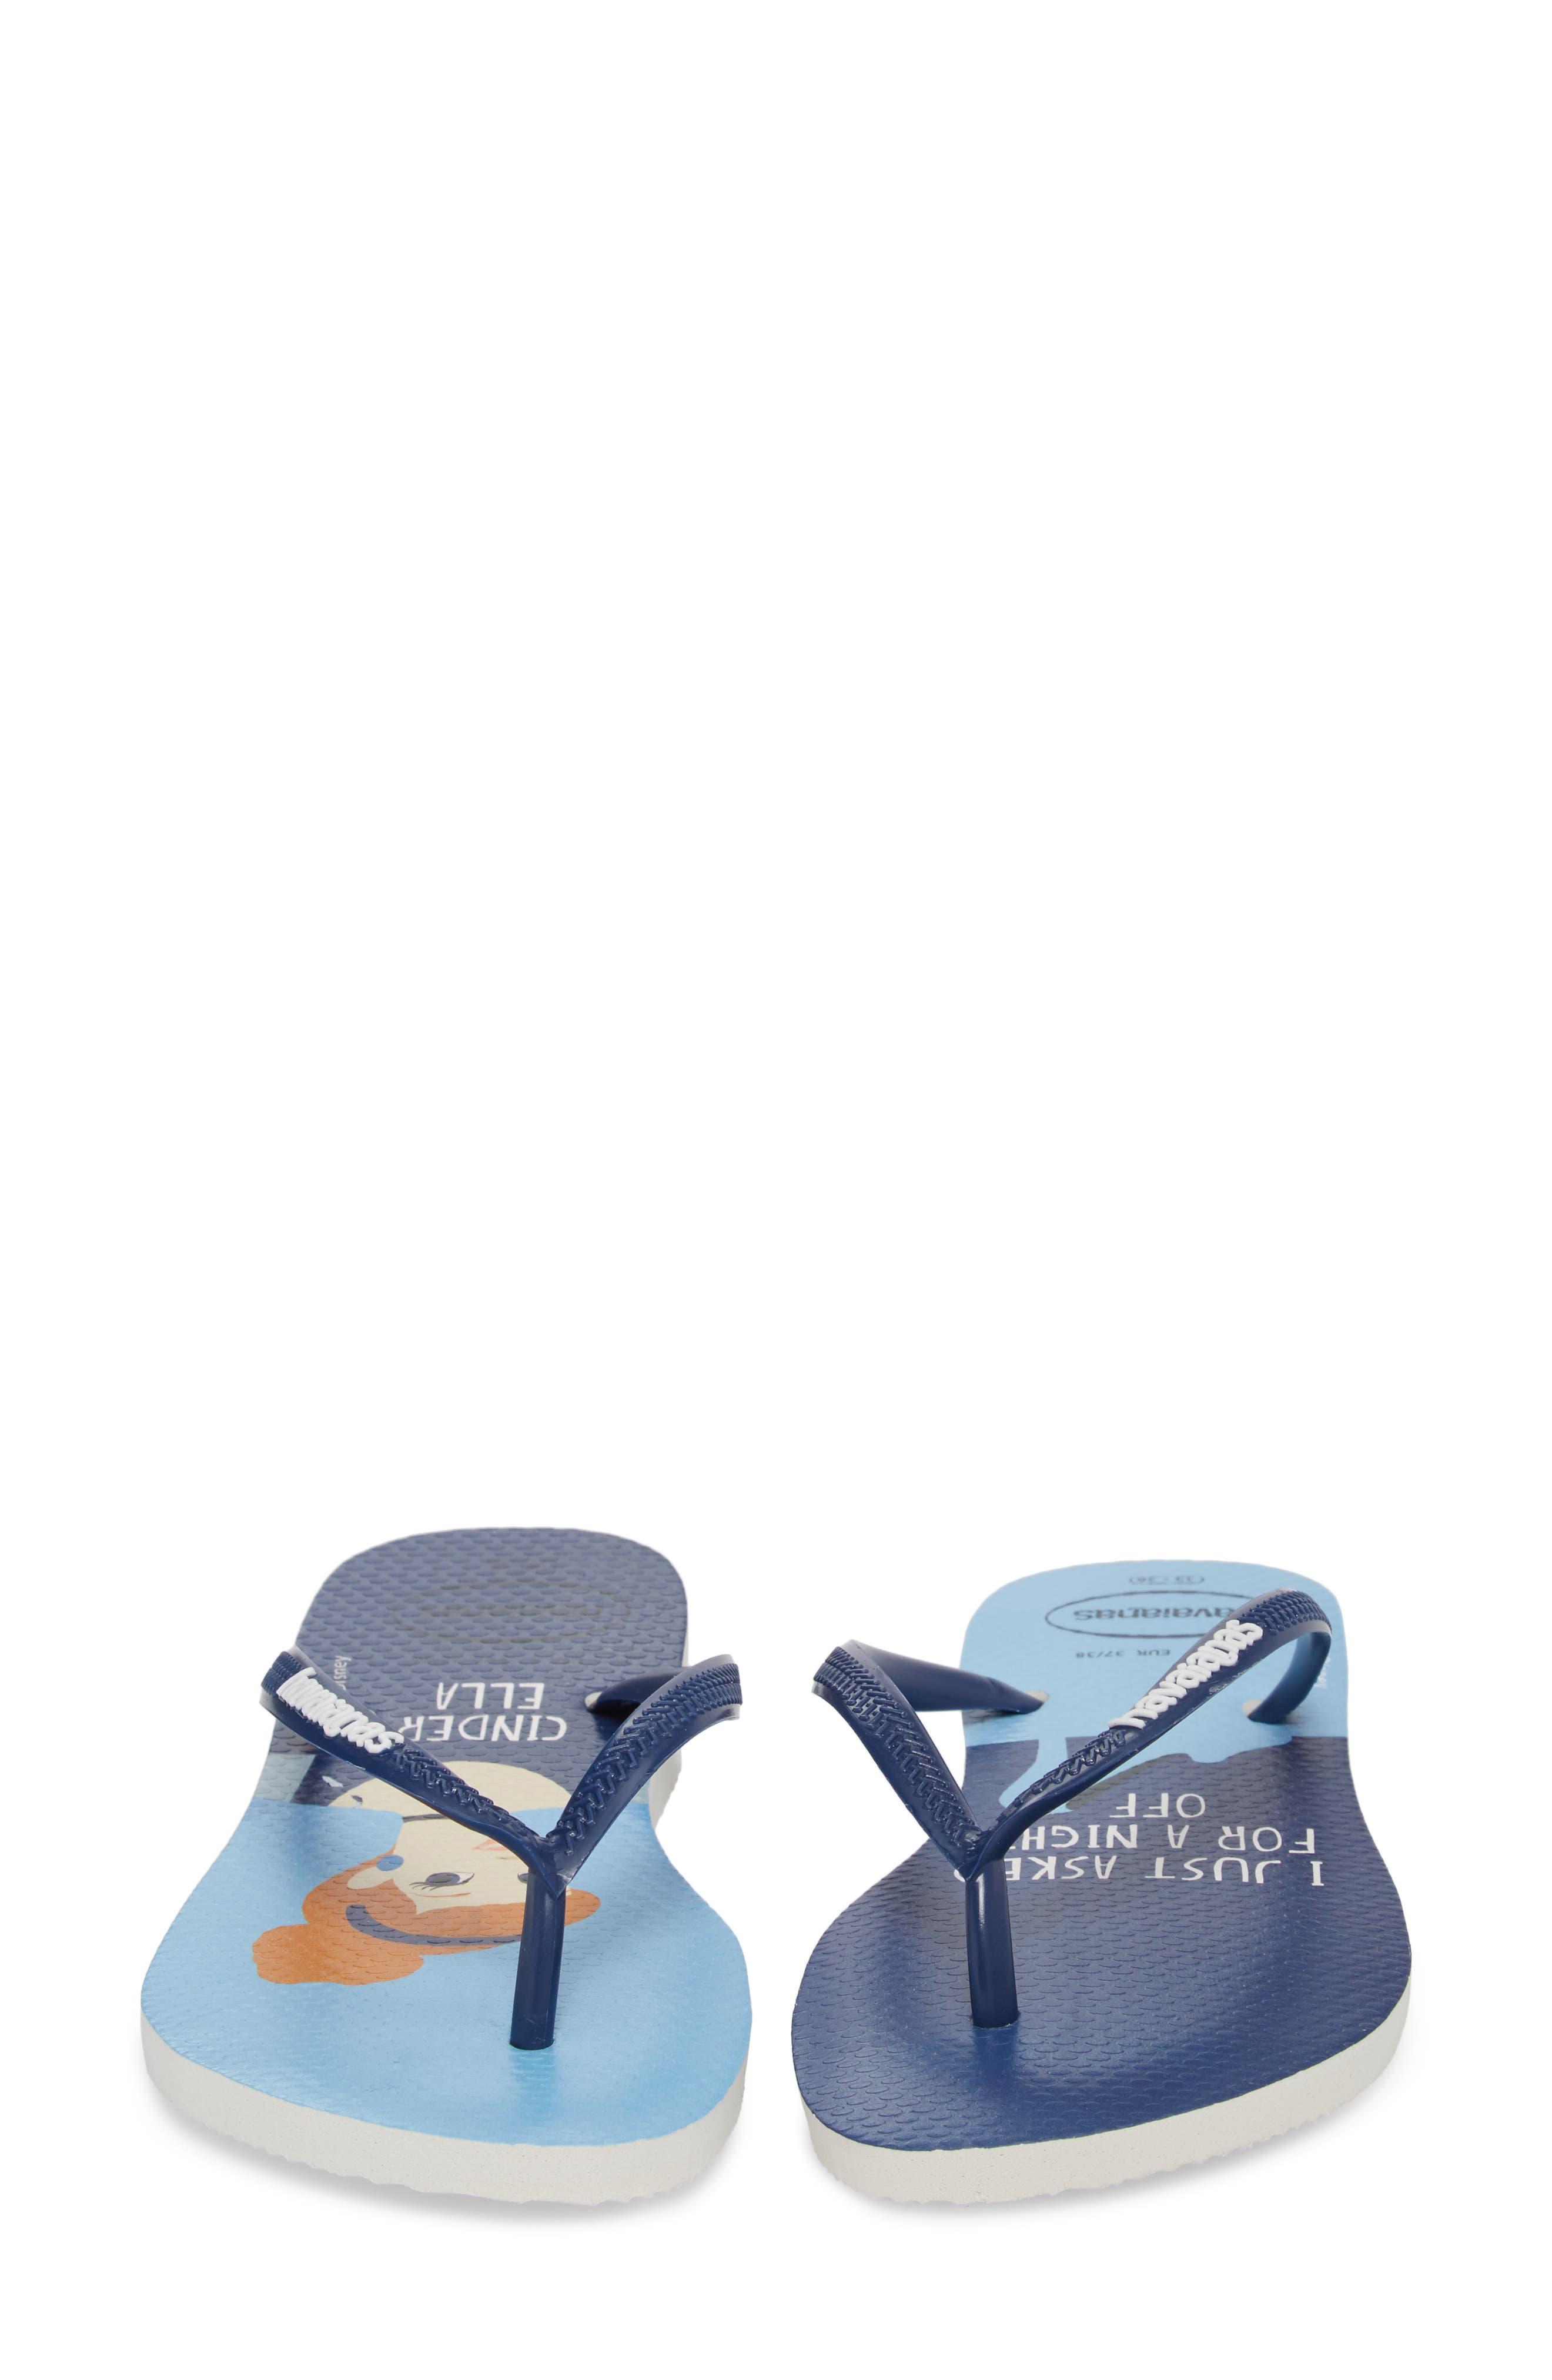 Havaiana Slim - Disney Princess Flip Flop,                             Alternate thumbnail 4, color,                             401